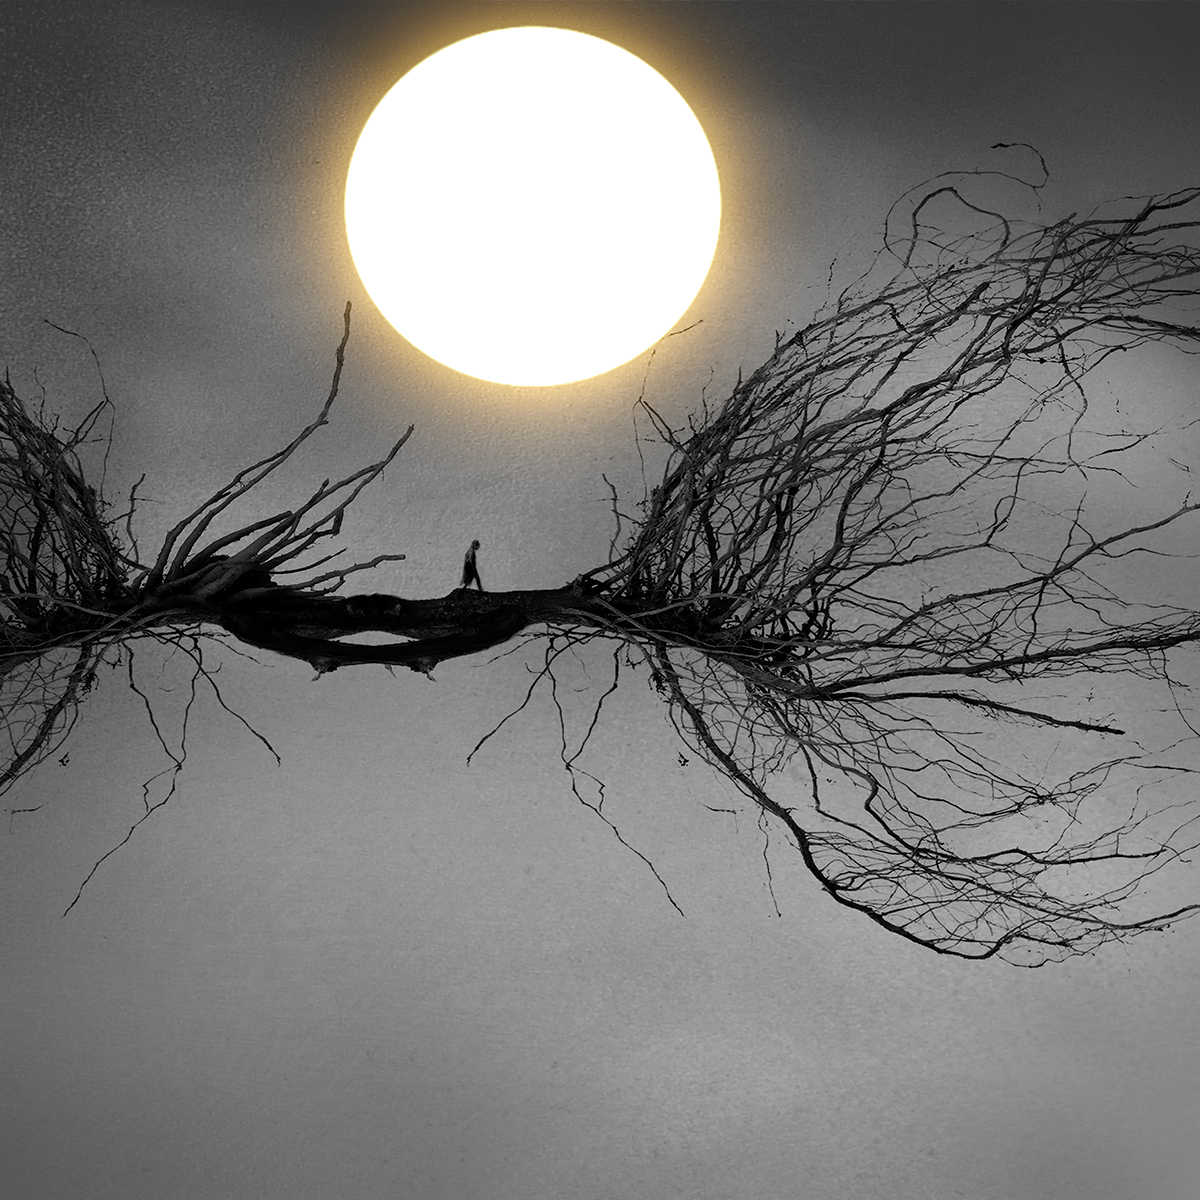 sun loves moon_2small.jpg